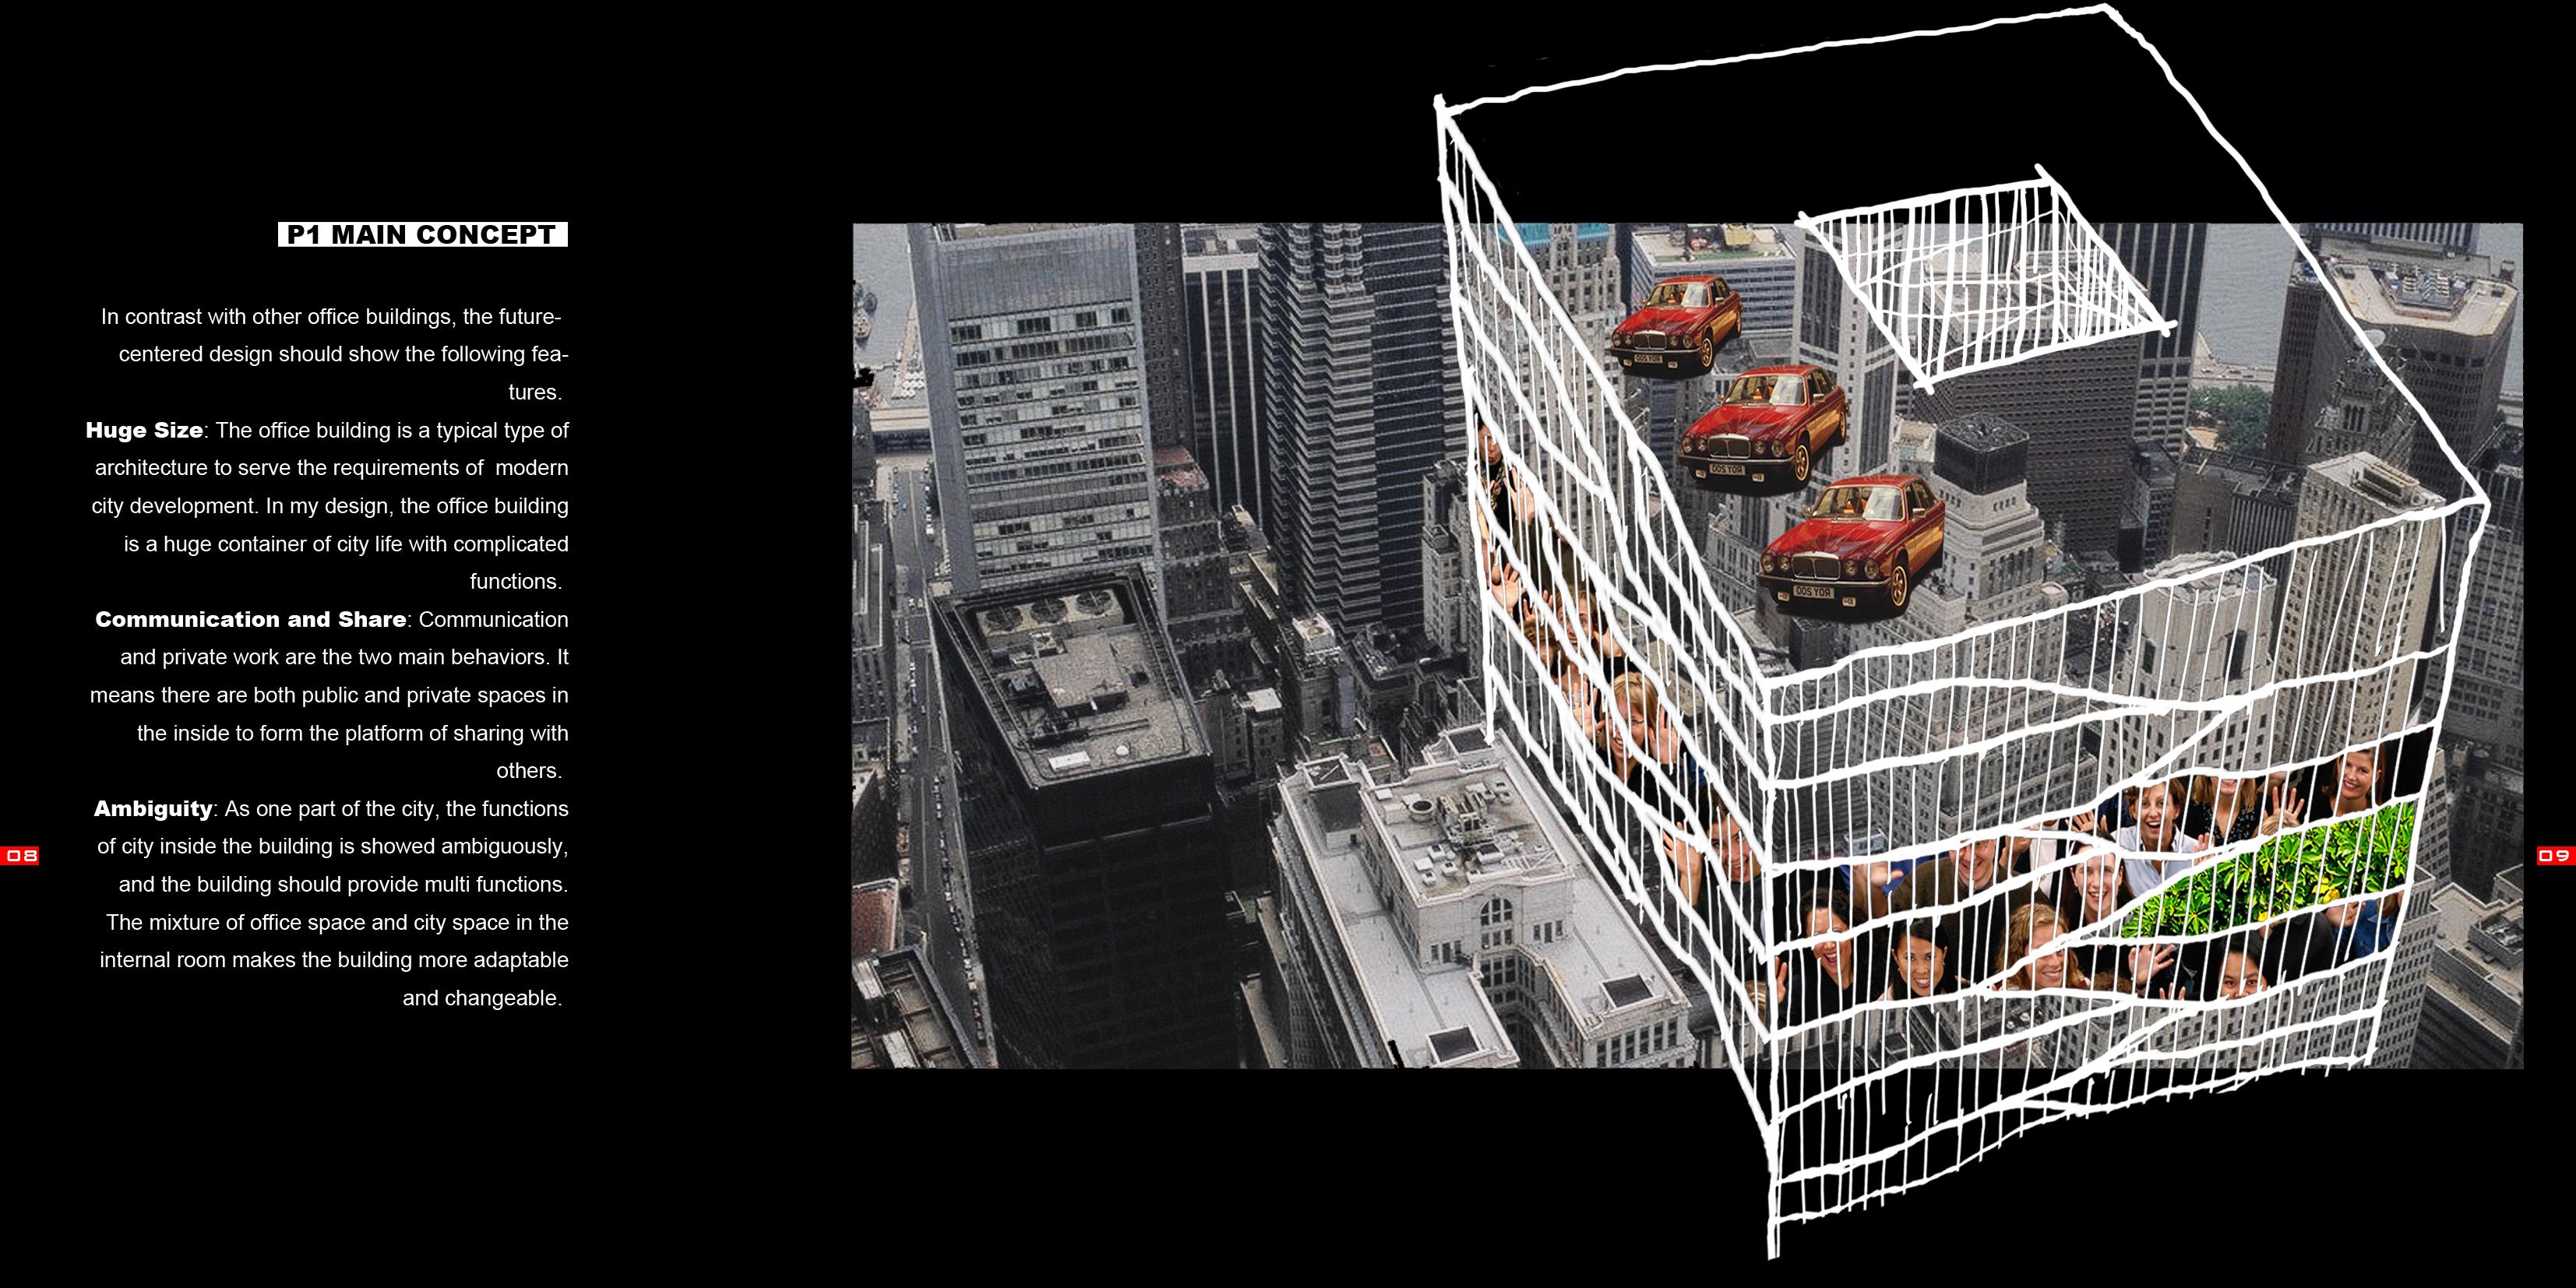 Office Building Design Concepts Images